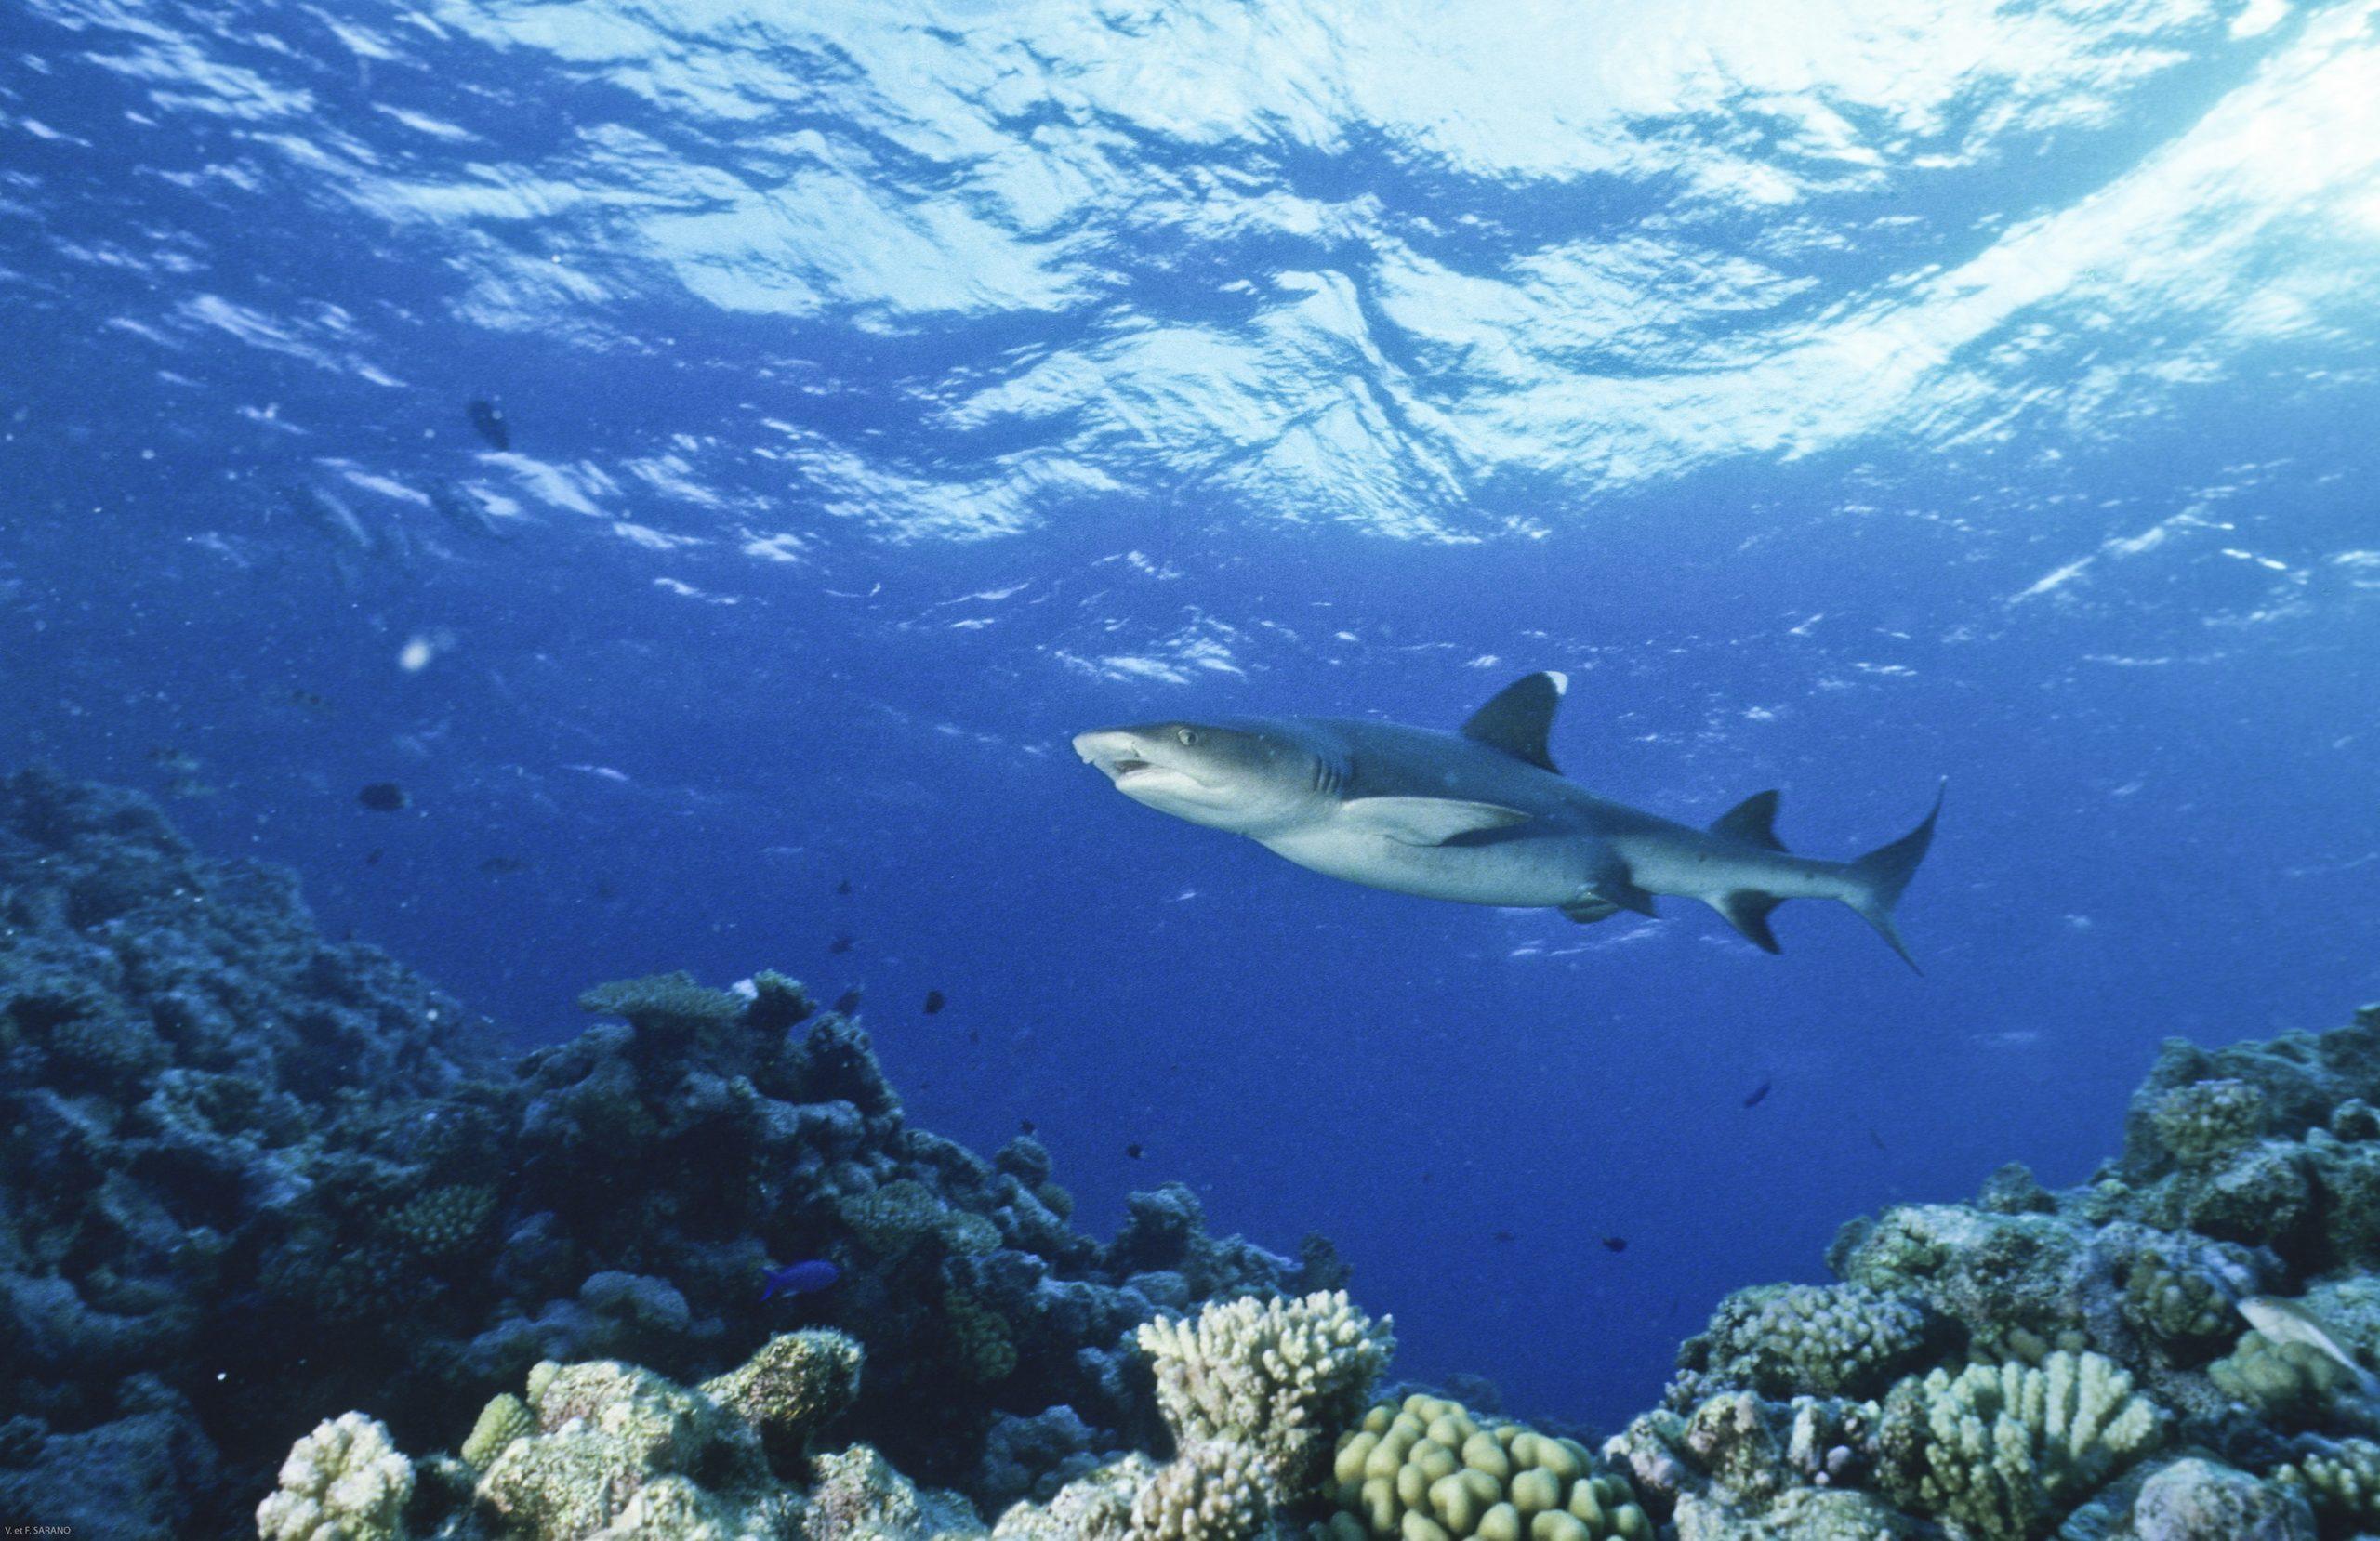 VFS Requin Pointe blanche du lagon scaled